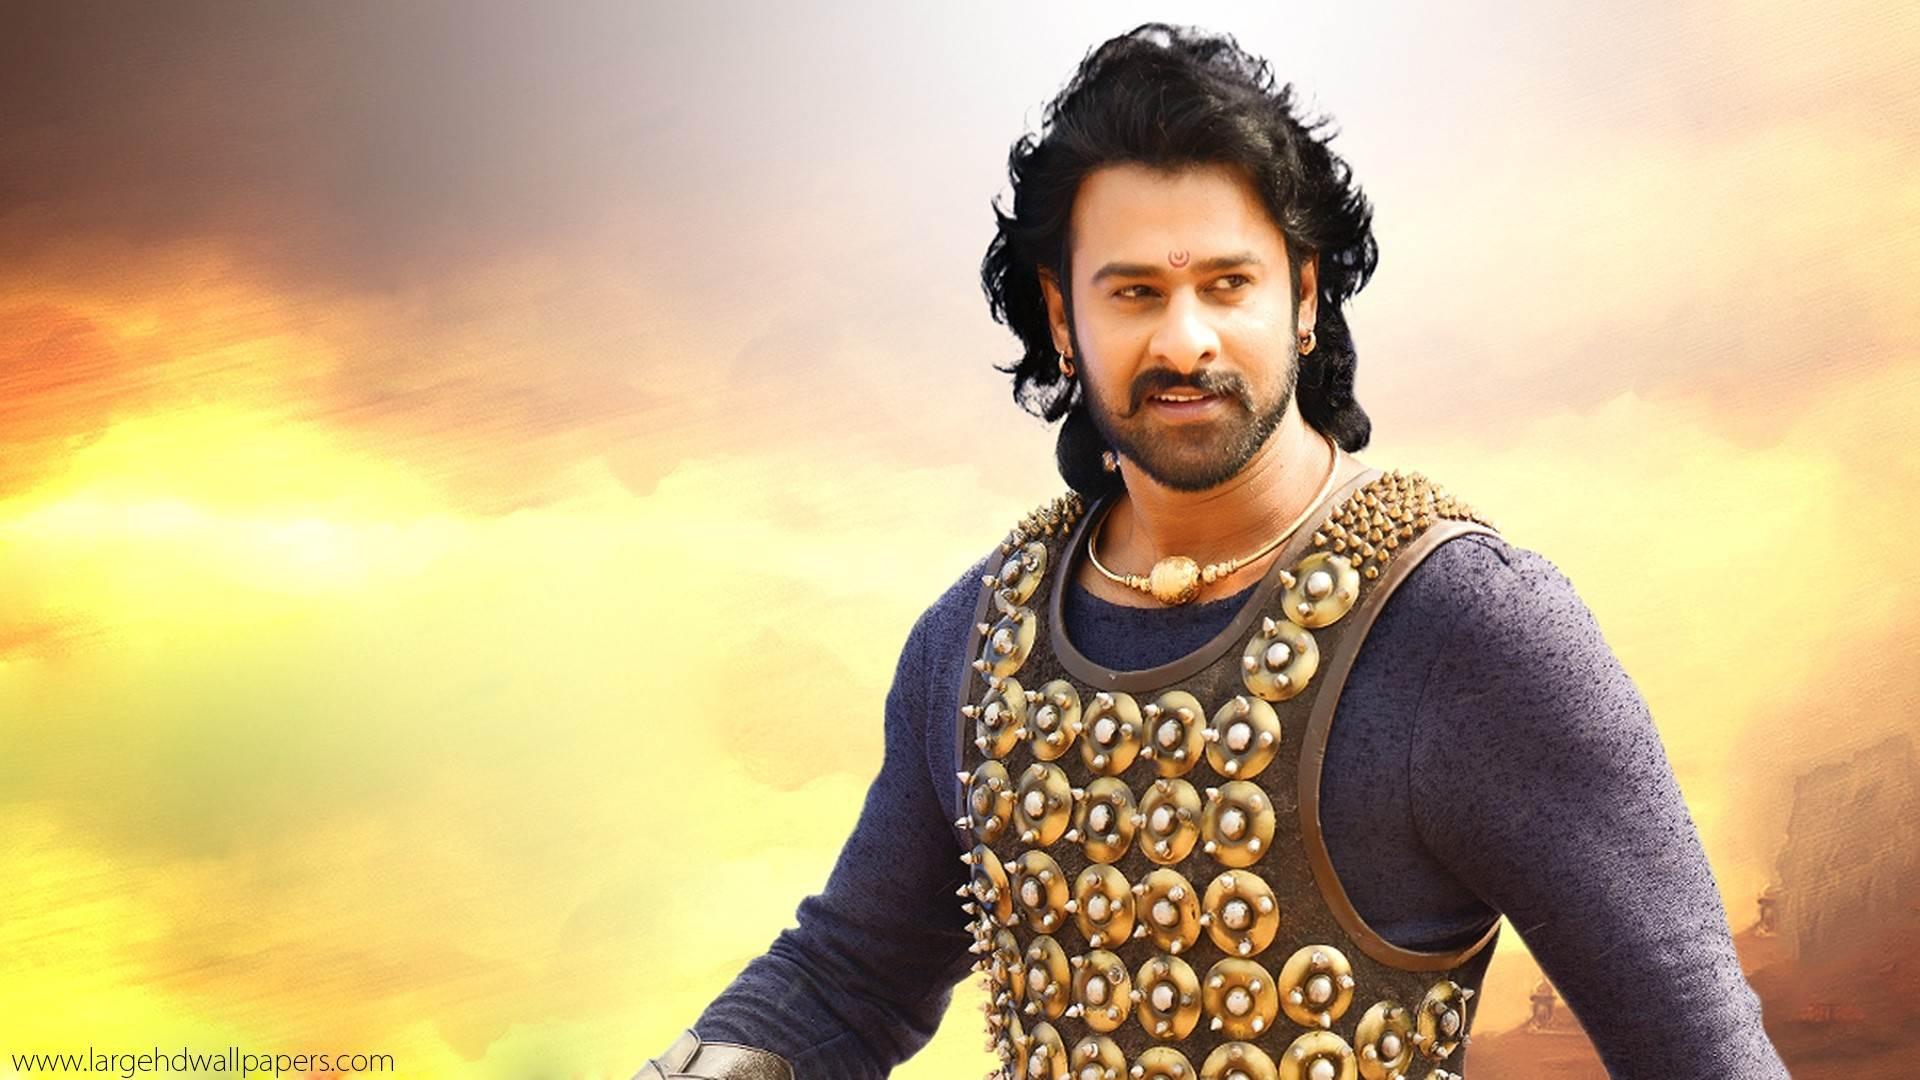 Prabhas Hd Images New: Telugu Actors HD Wallpapers (53 Wallpapers)